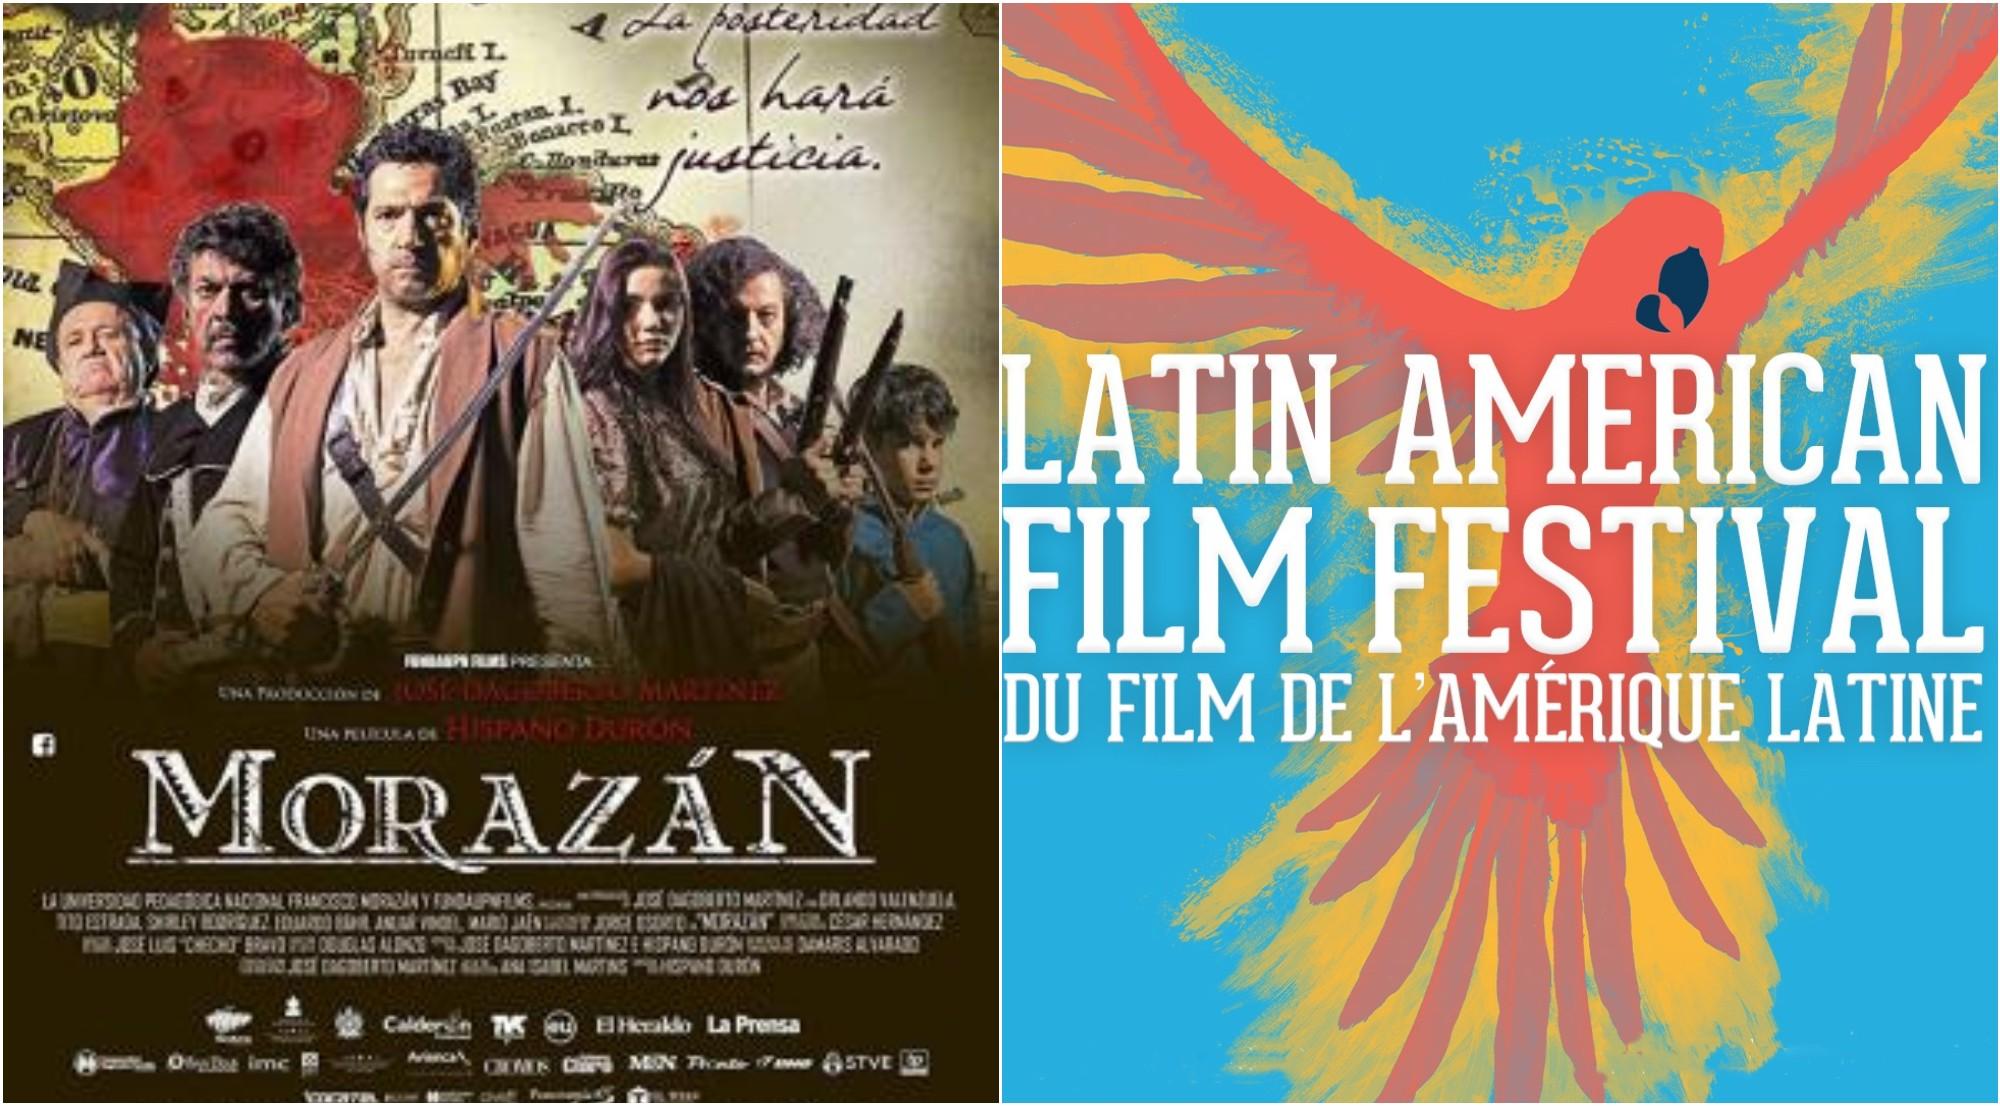 Honduras destaca en Festival de Cine Latinoamericano en Canadá